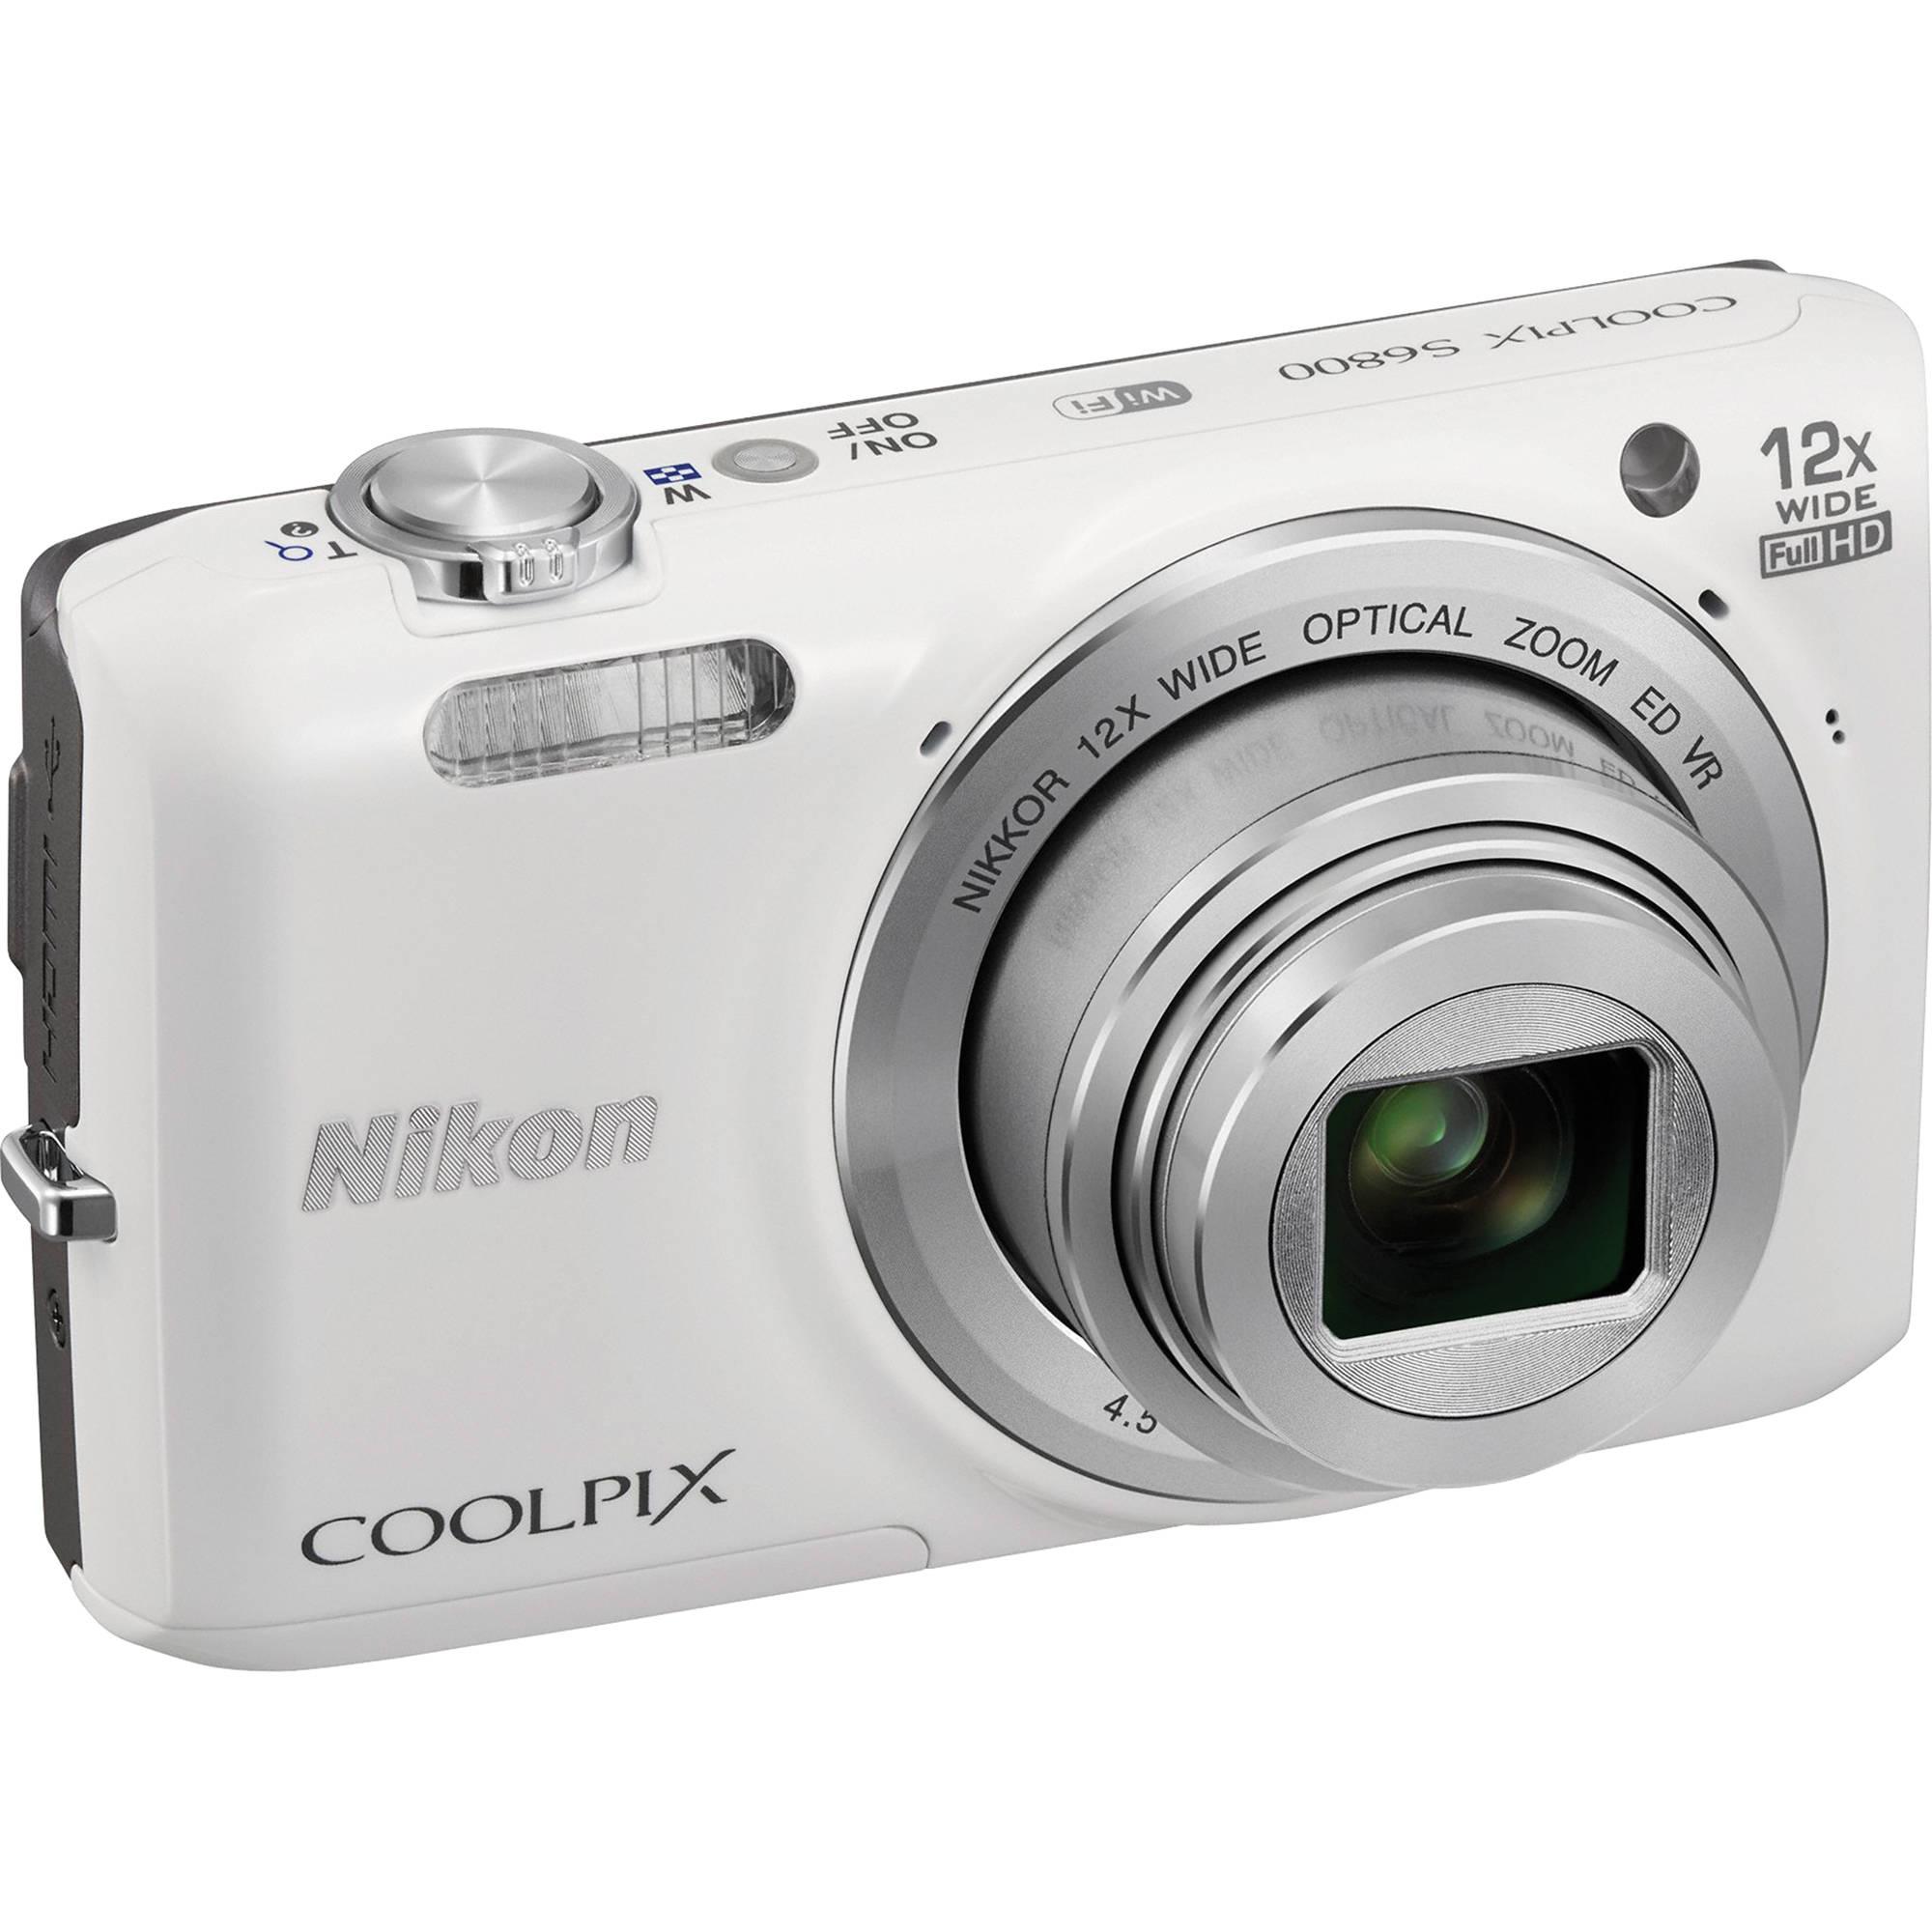 Nikon COOLPIX S6800 Camera Drivers Windows